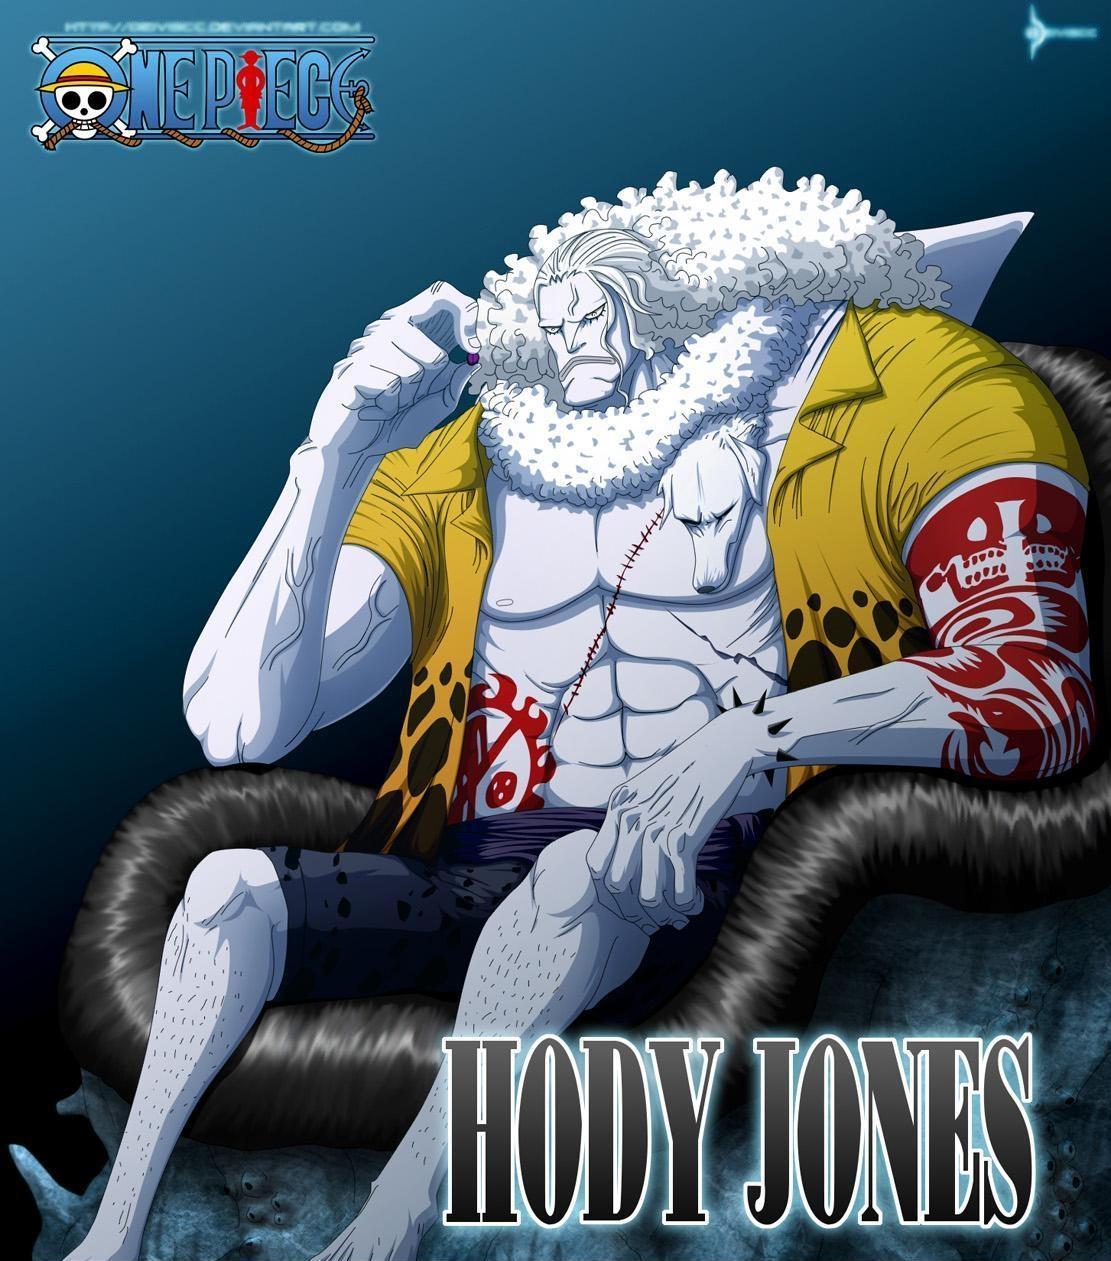 HODY_JONES.jpg